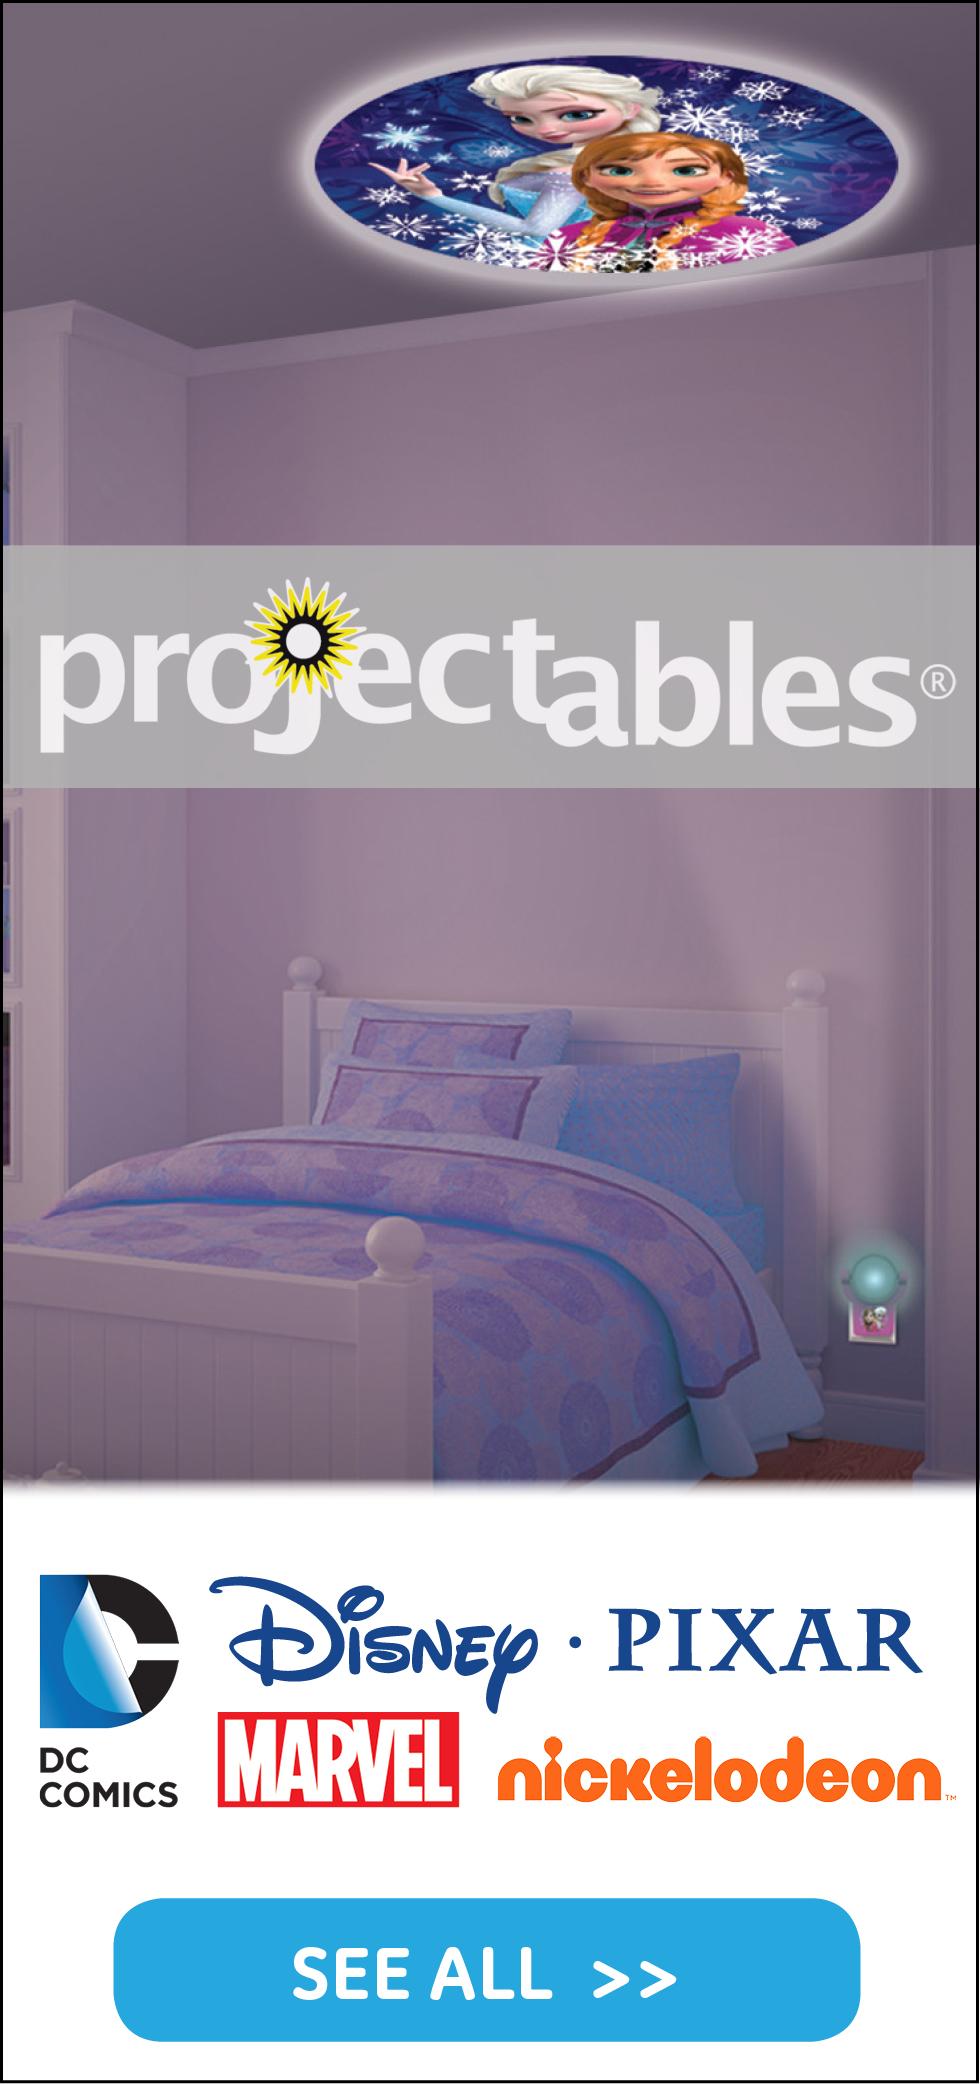 projectables-235x500-productmanual